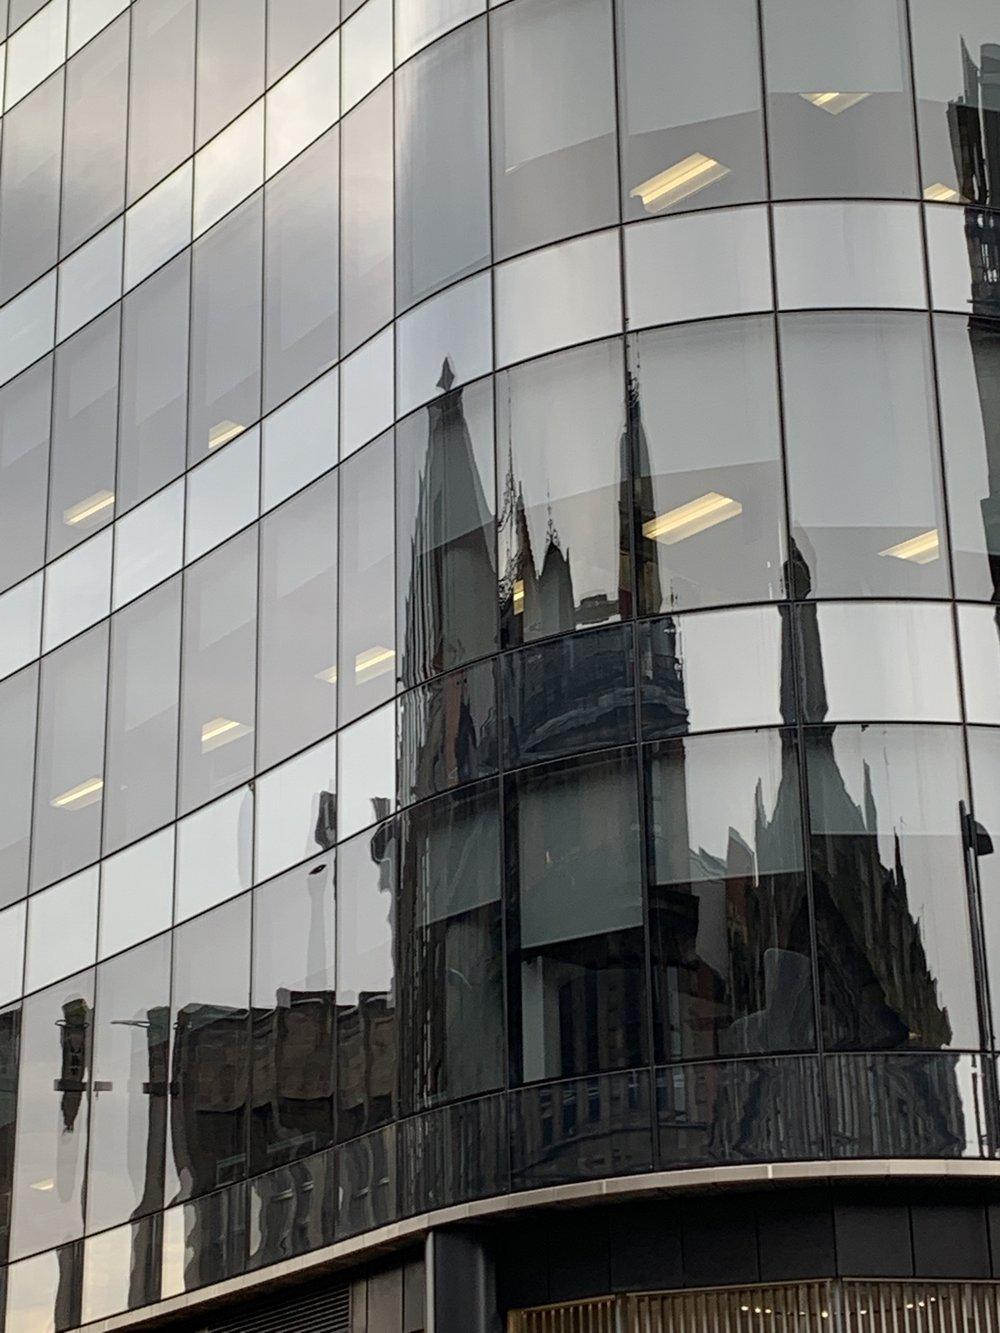 Ancient architecture reflected in modern windows. Glasgow, Scotland